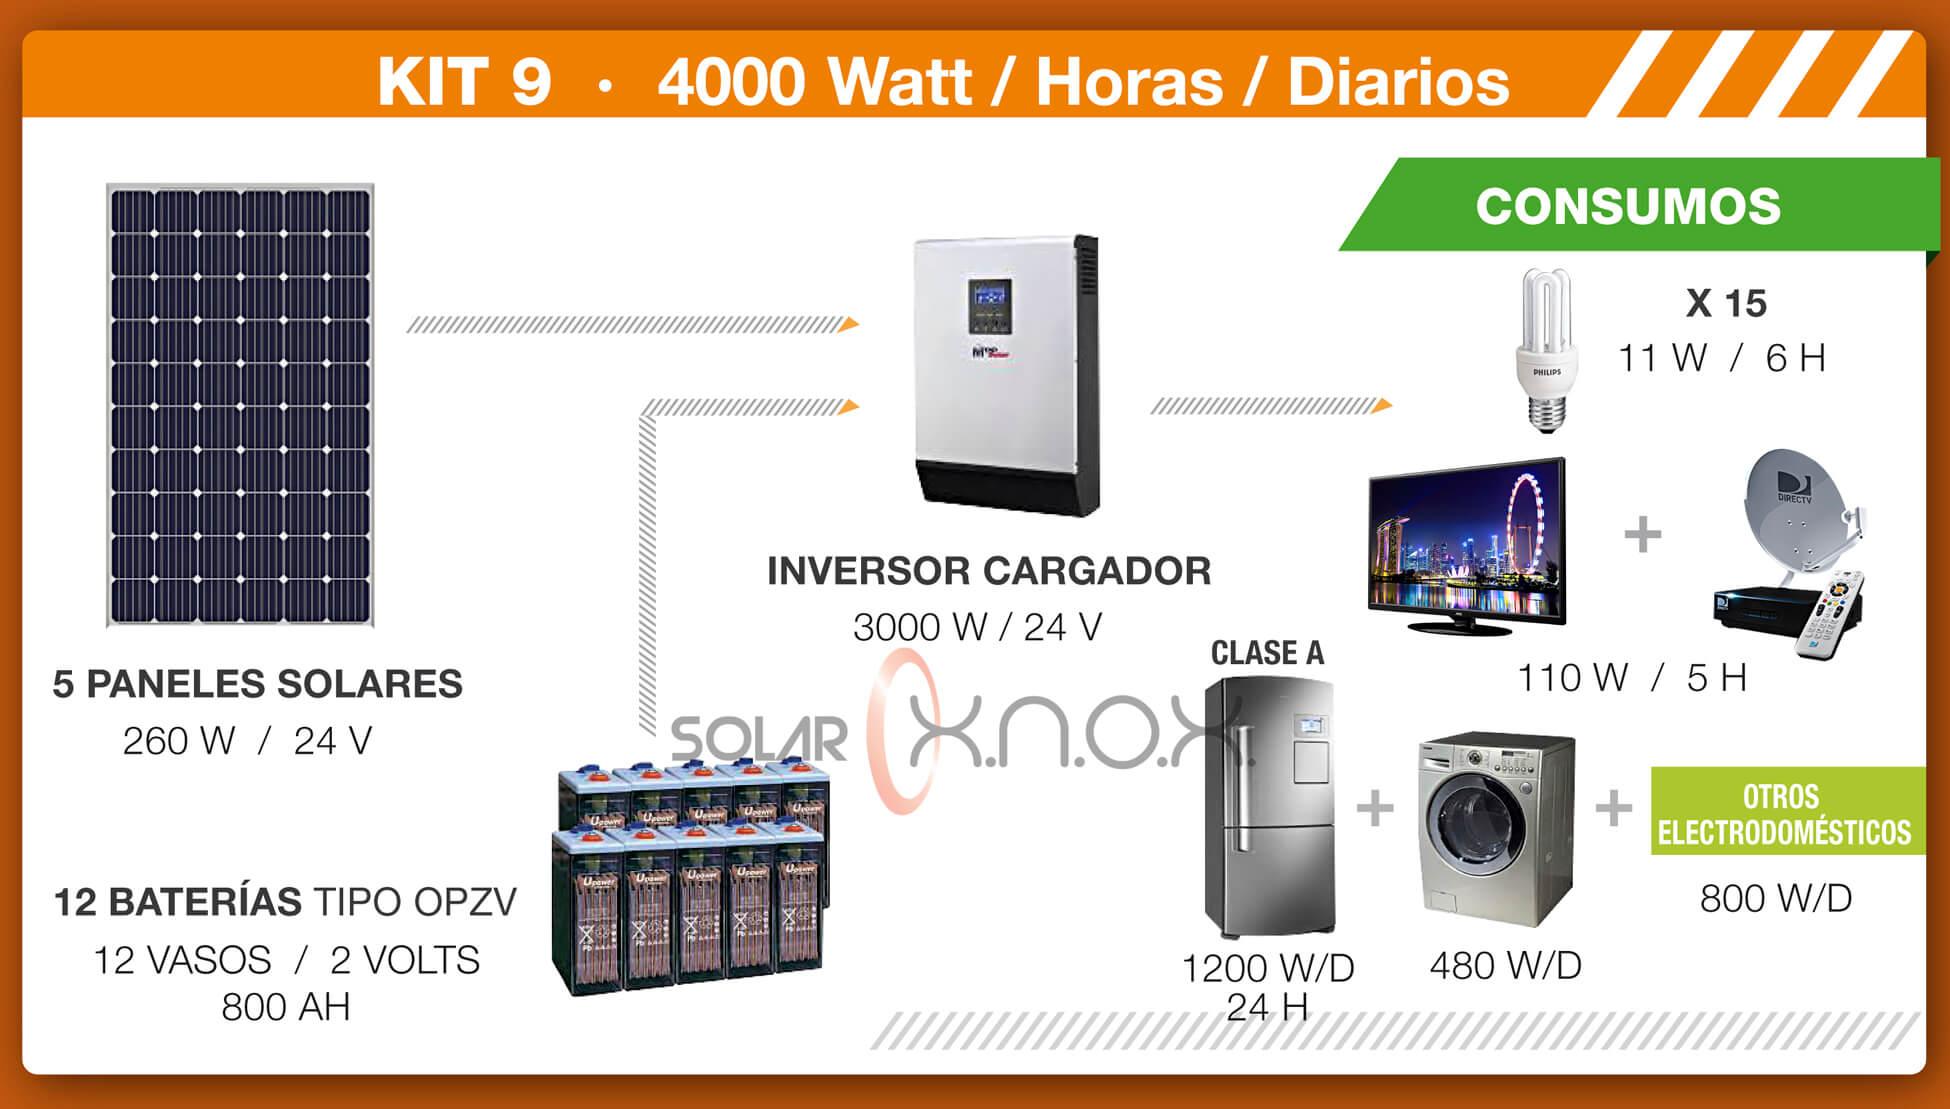 Kit solar 9